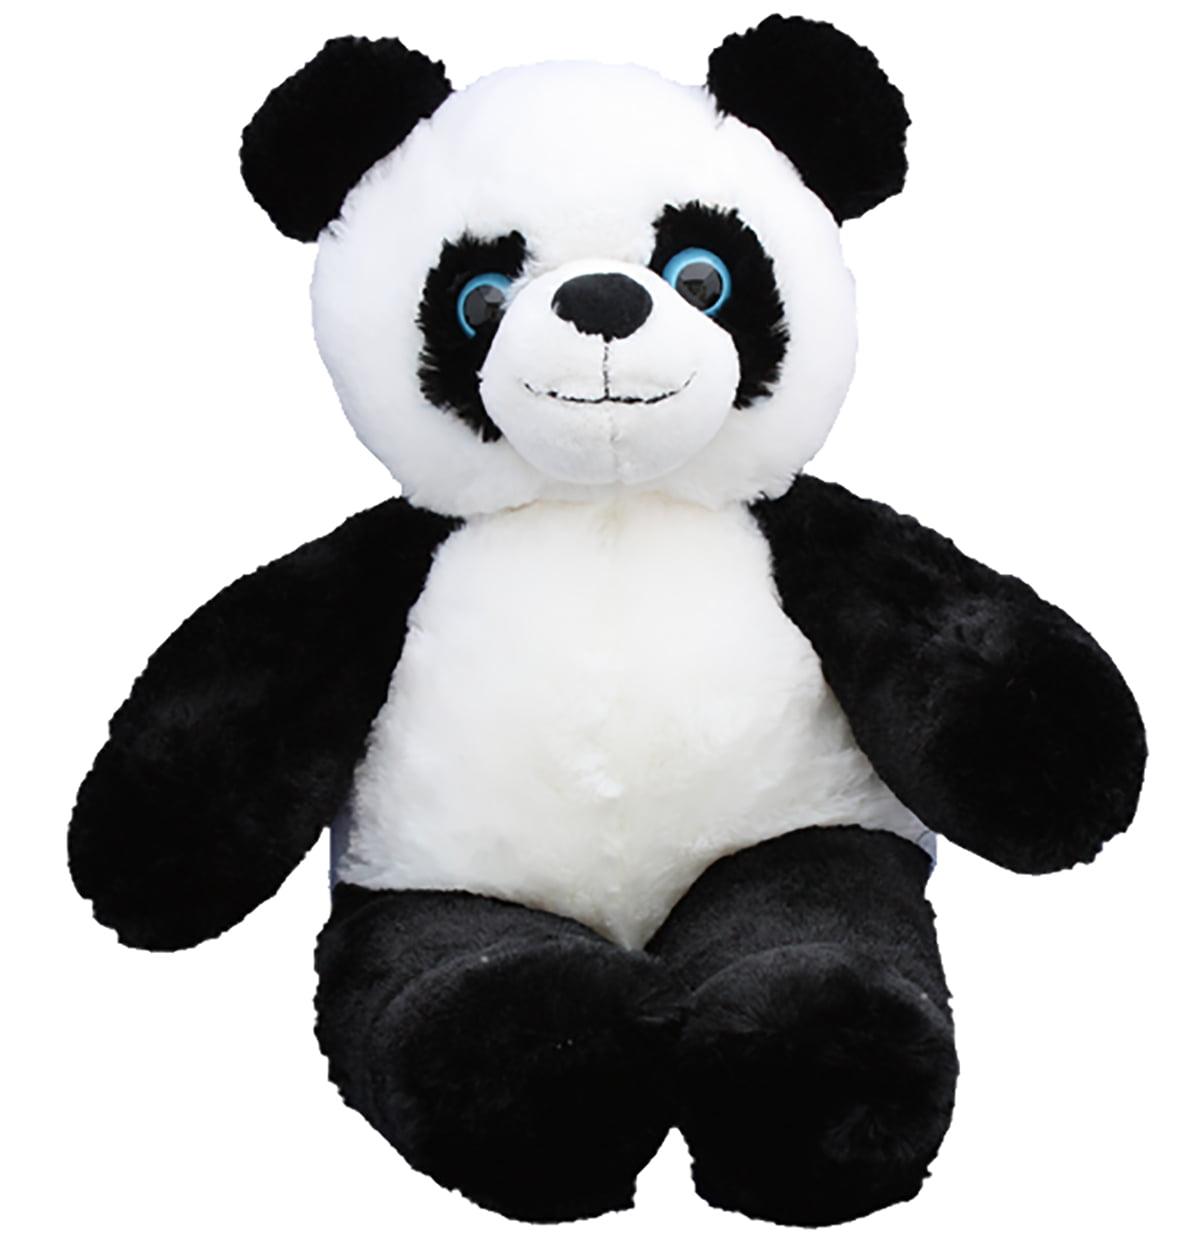 Recordable Teddy Bear Walmart, Record Your Own Plush 16 Inch Panda Bear Ready To Love In A Few Easy Steps Walmart Com Walmart Com